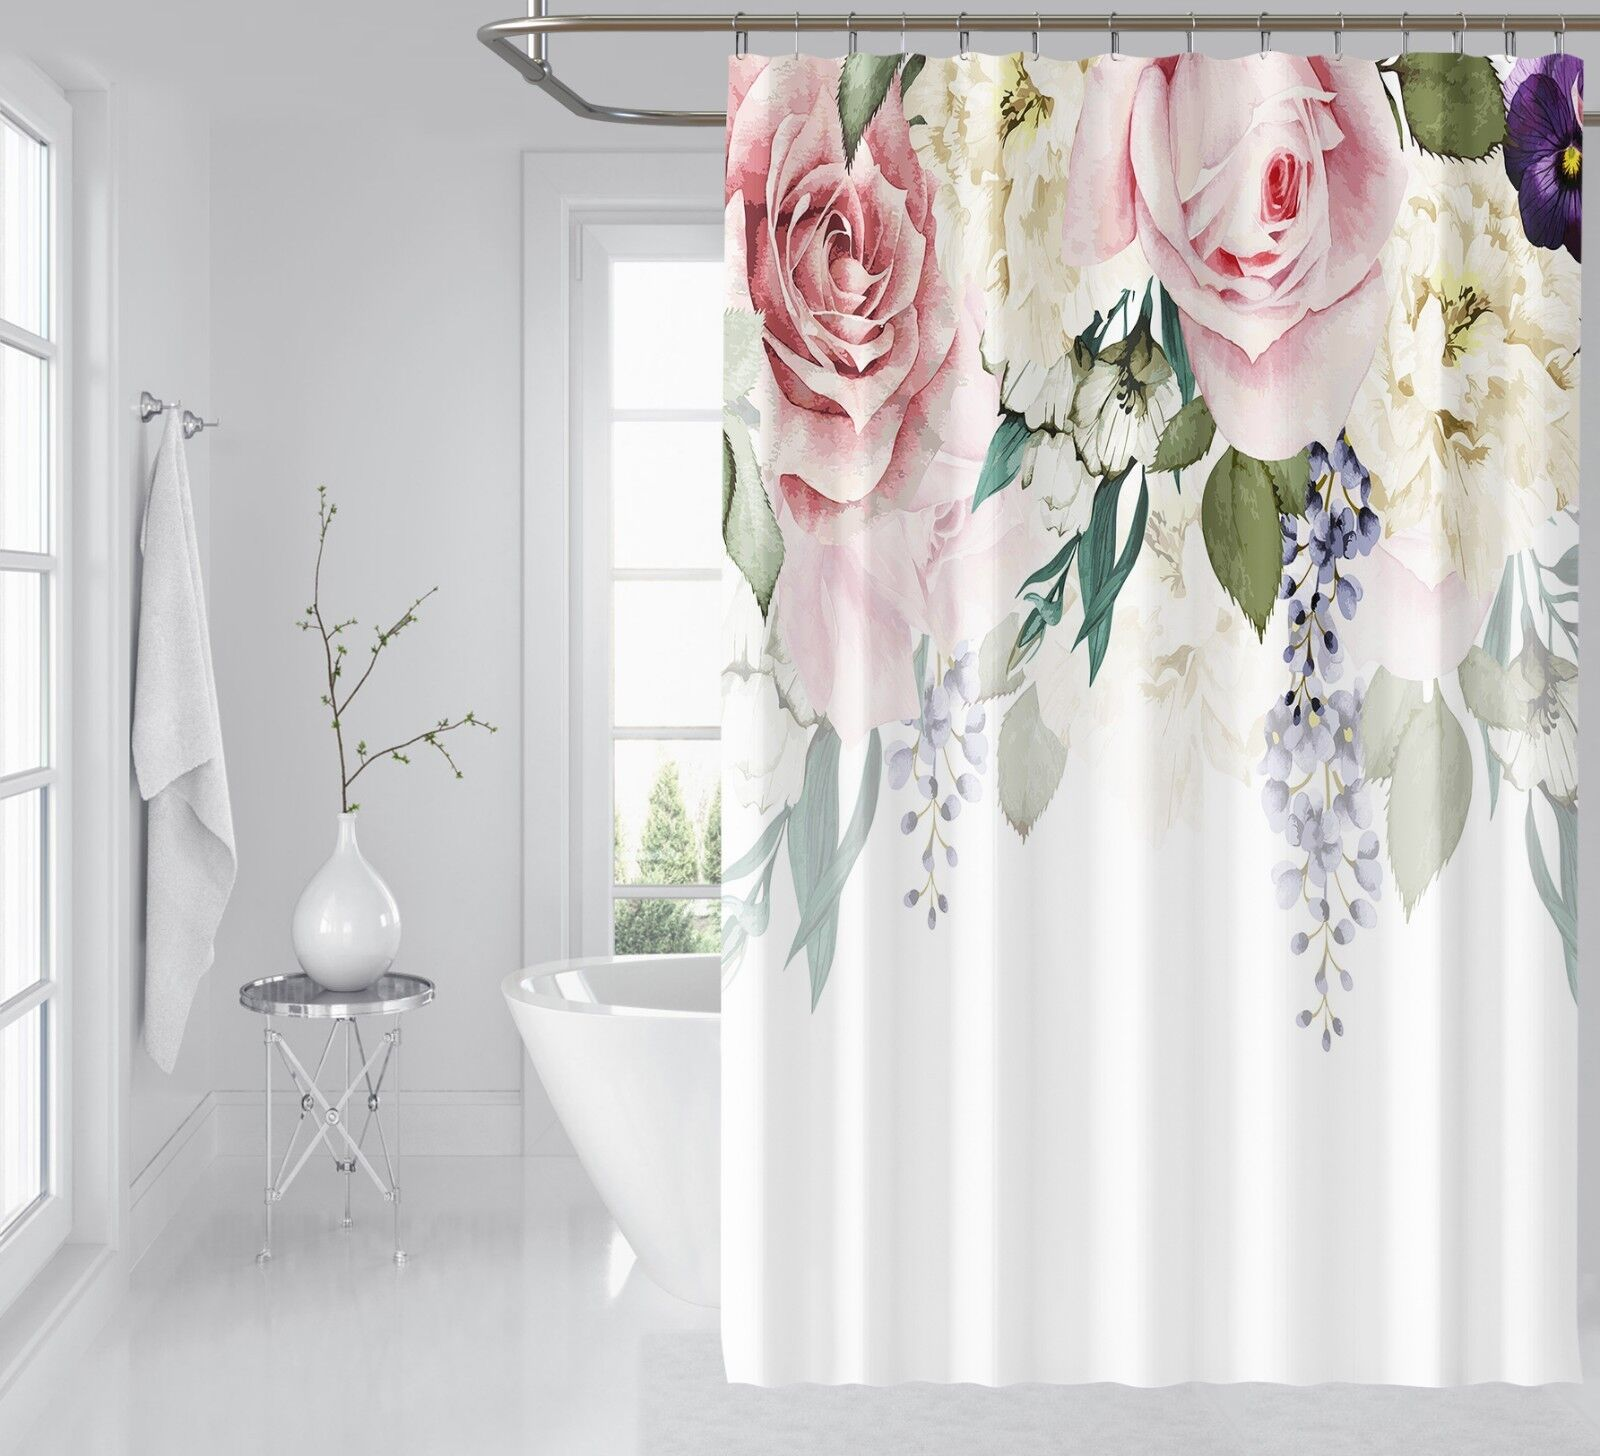 3D Fiore Bloom 425 Tenda da doccia IMPERMEABILE Fibra Bagno WC CASA FINESTRE